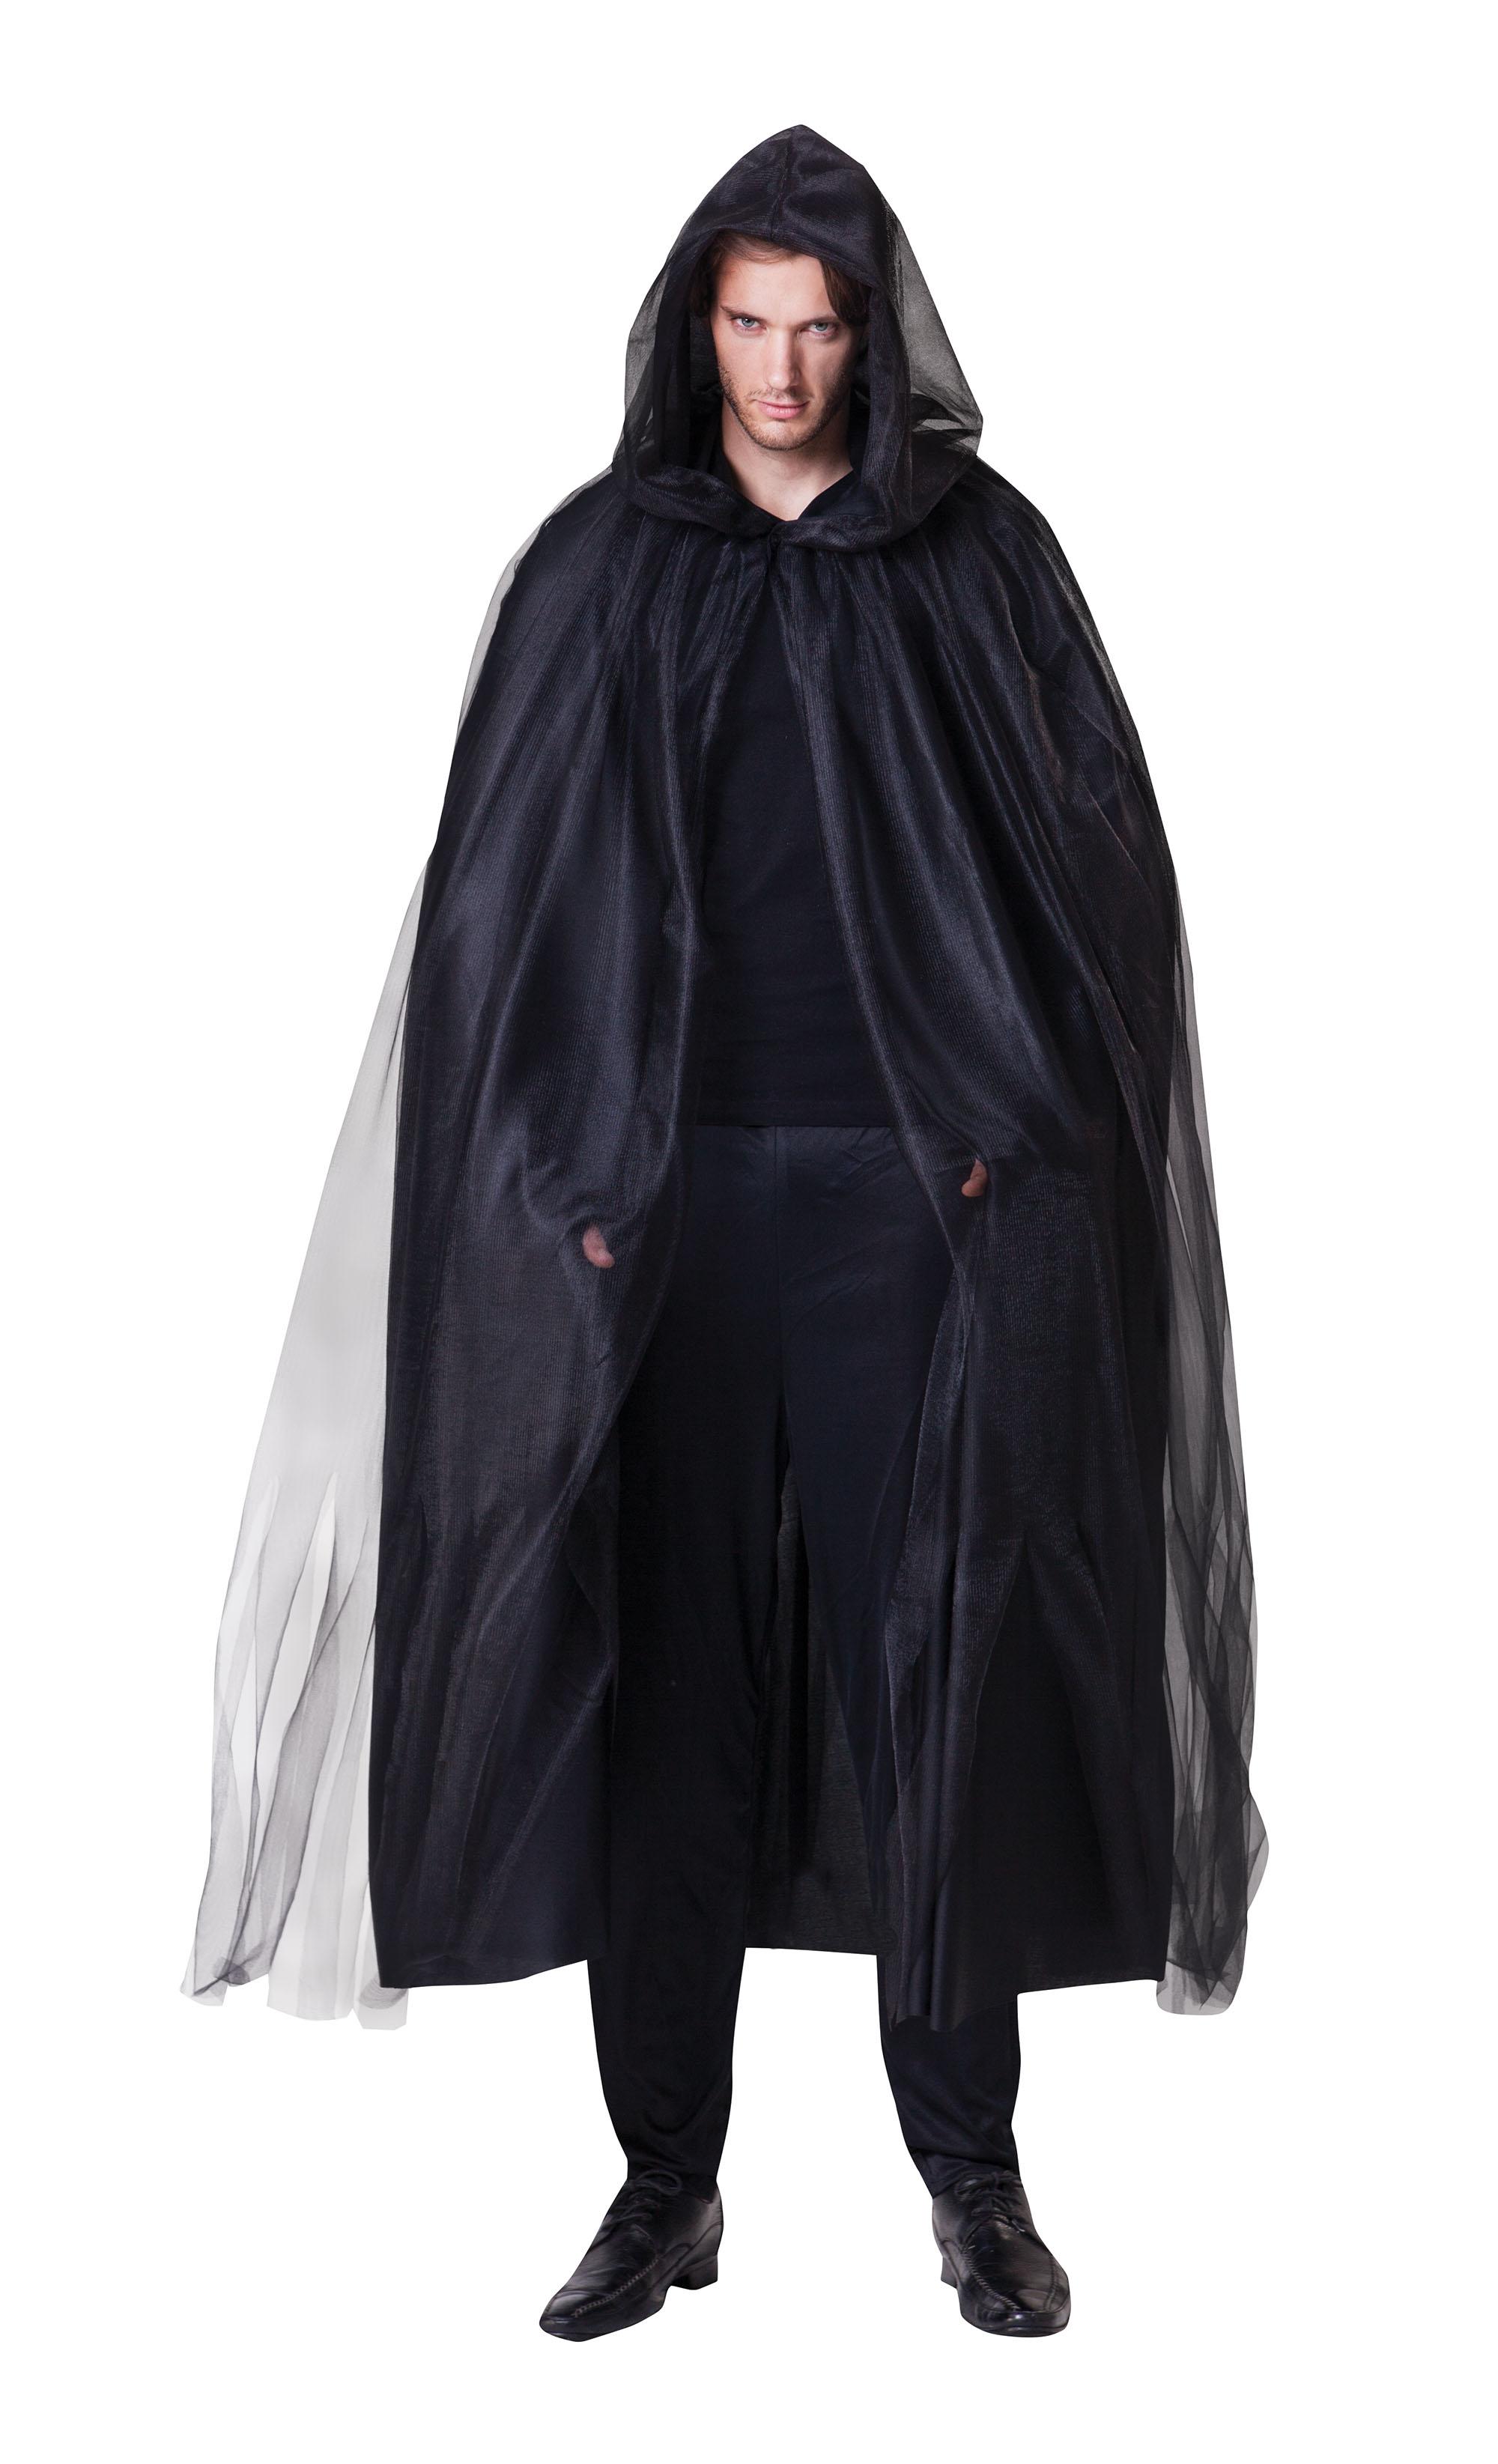 Mens Womens Black Hooded Cloak Cape Halloween Vampire Fancy Dress Costume